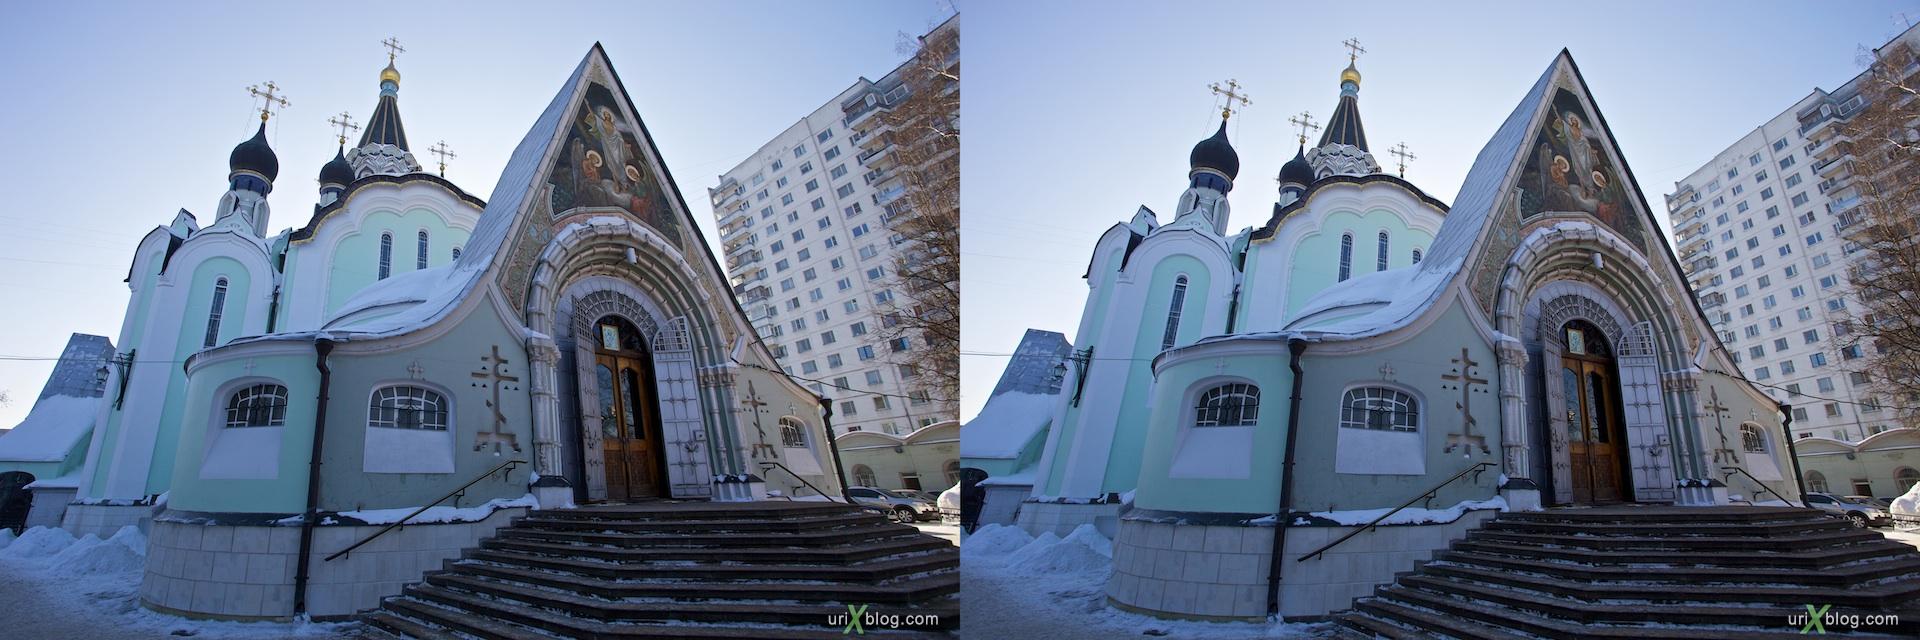 2010 3D, stereo, cross-eyed, стерео, стереопара Moscow, Москва, Церковь Воскресения Христова